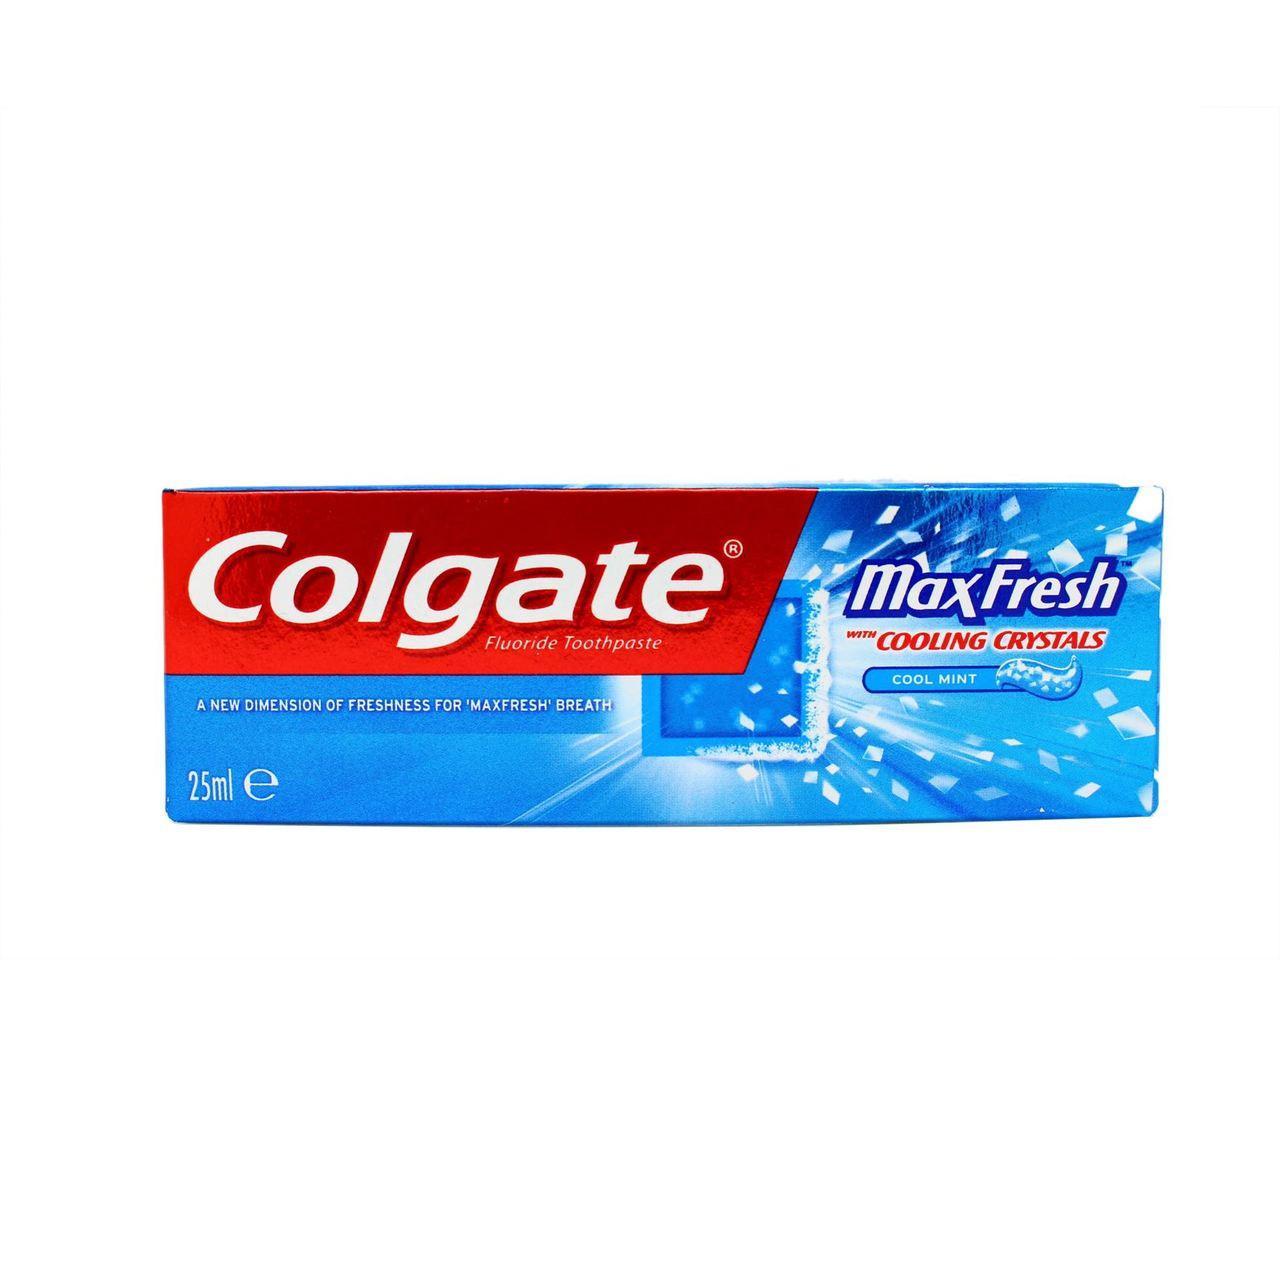 Colgate Max Fresh Mini Toothpaste 25ml Go Tiny